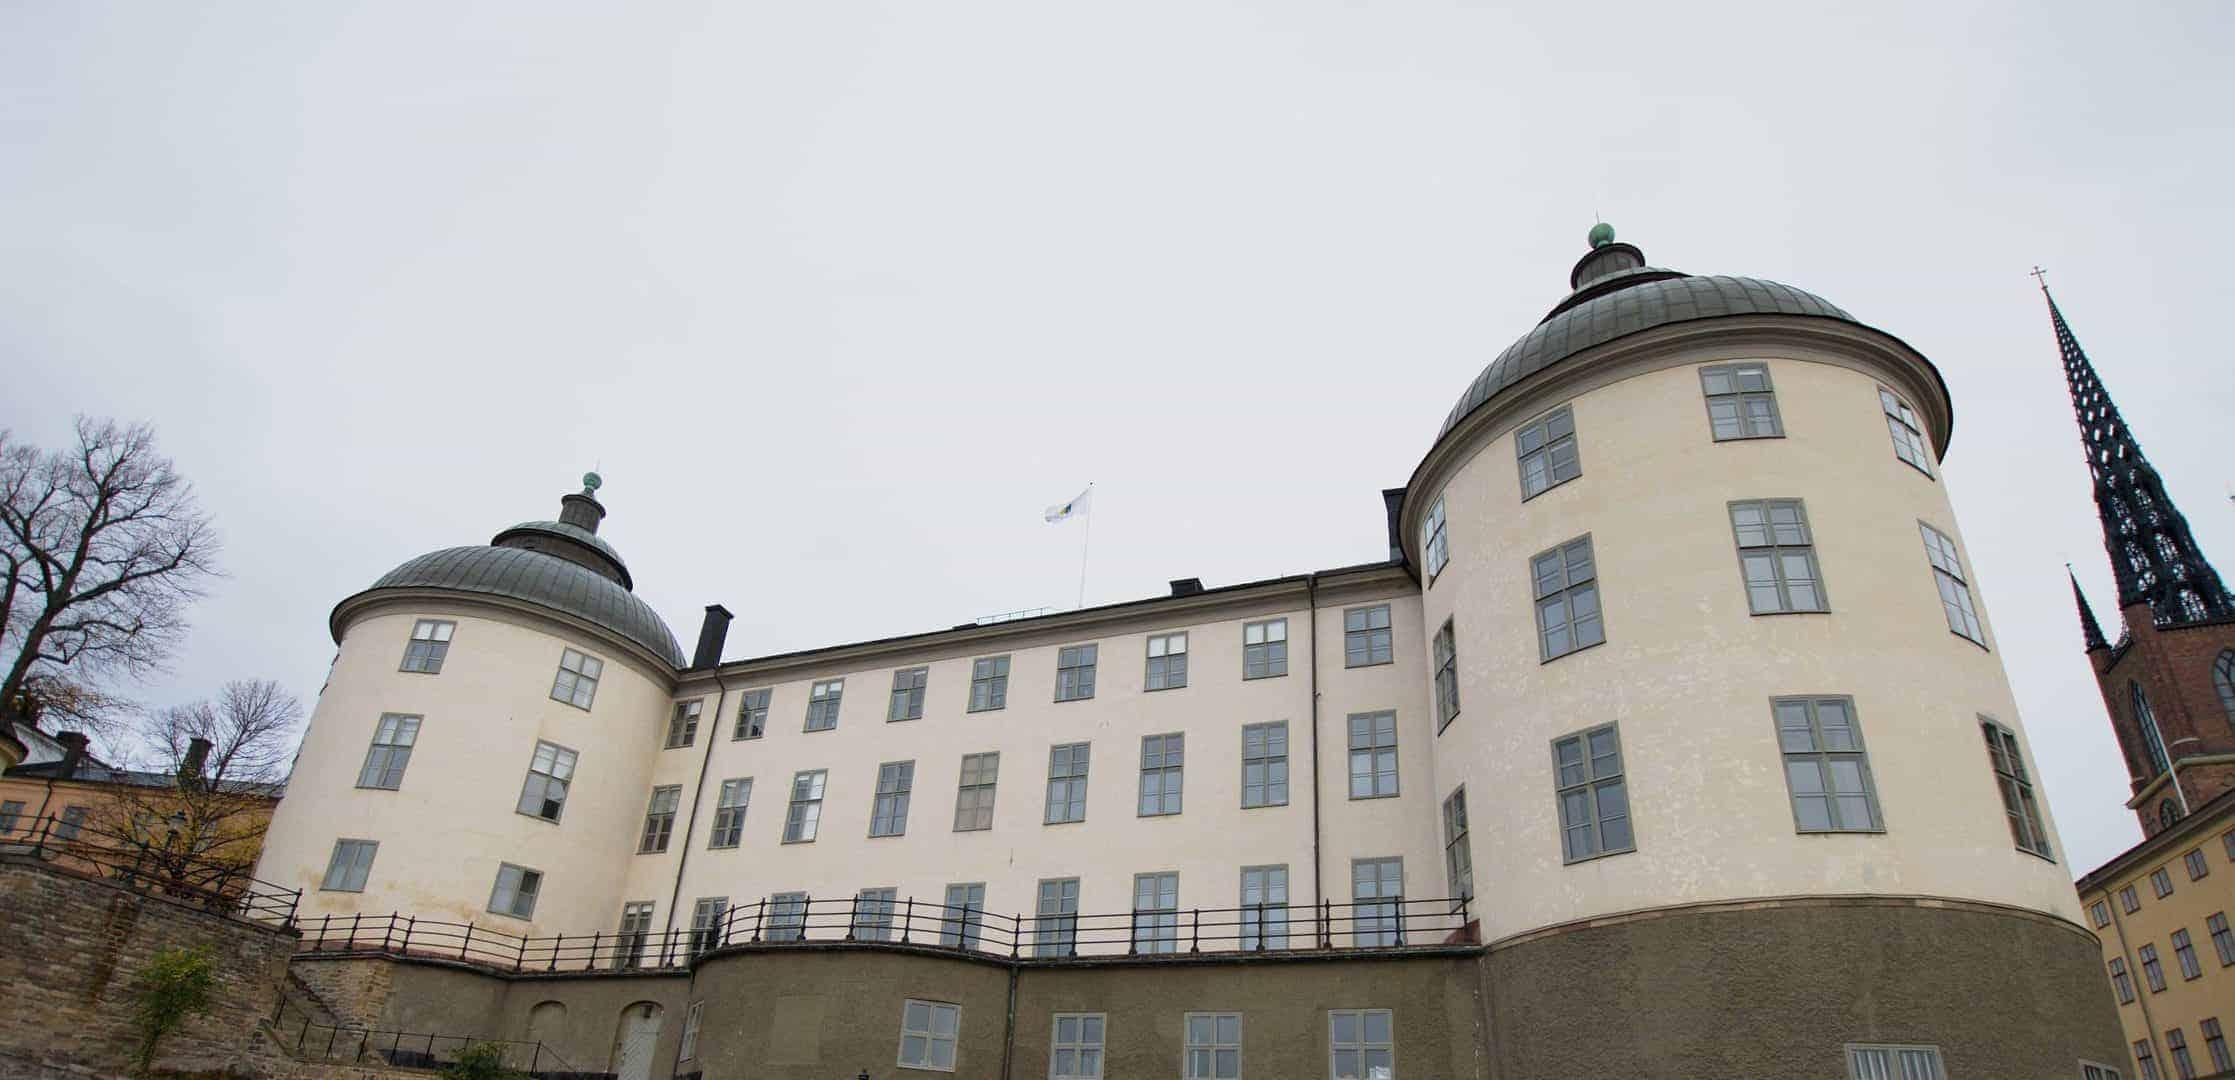 essential_Stockholm_tourpoint2_wrangel_roundtowersrear_3